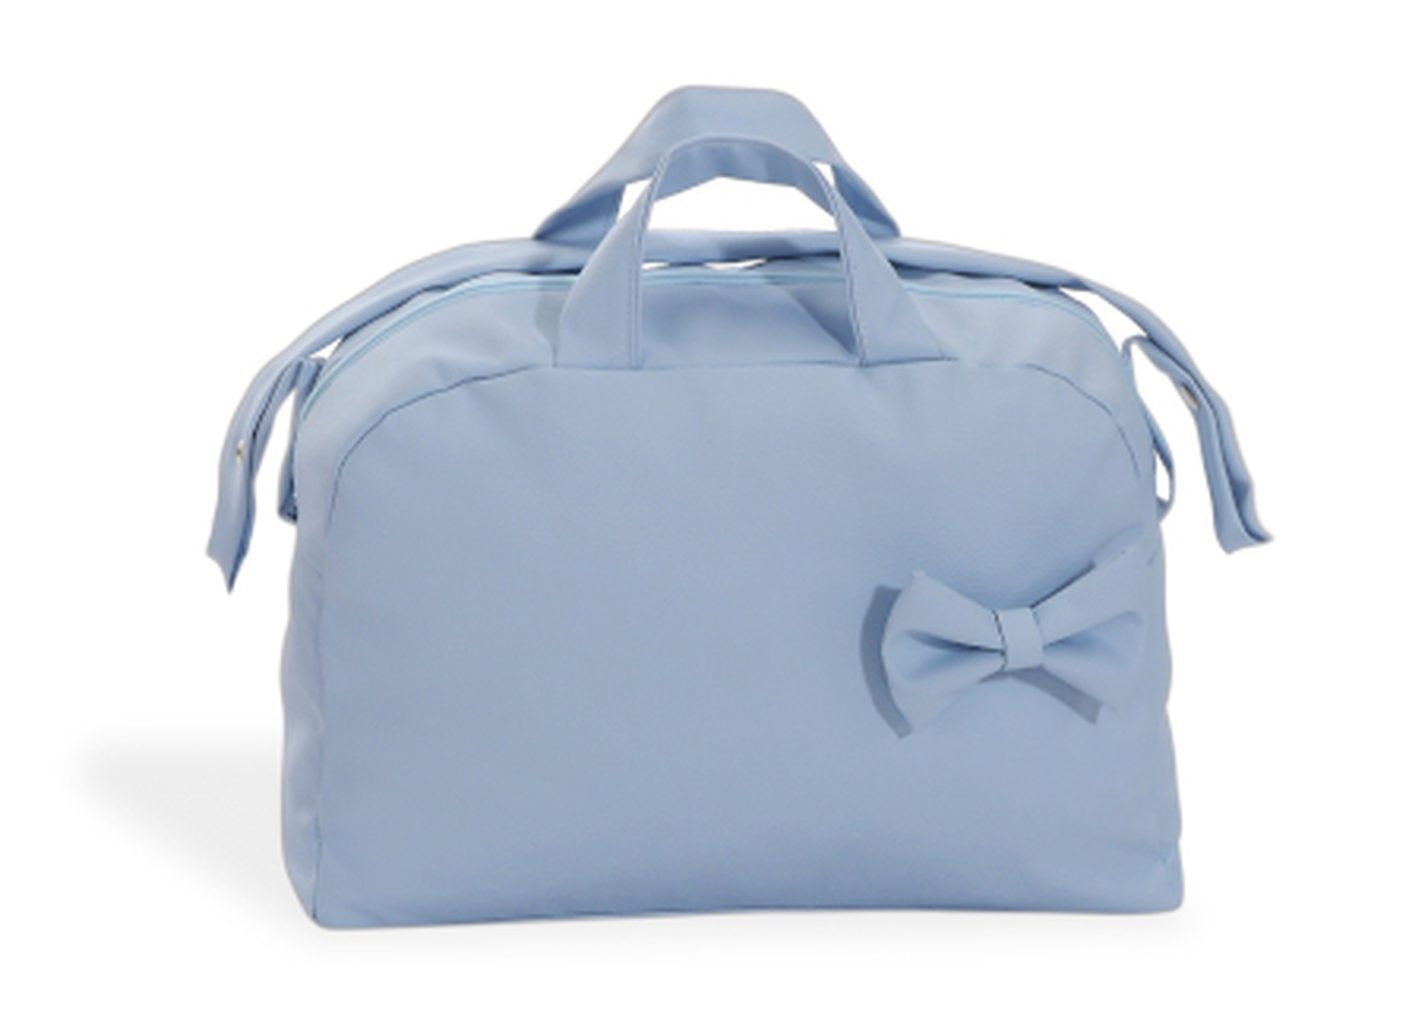 Interbaby Gros Sac Maternel Bleu Clair